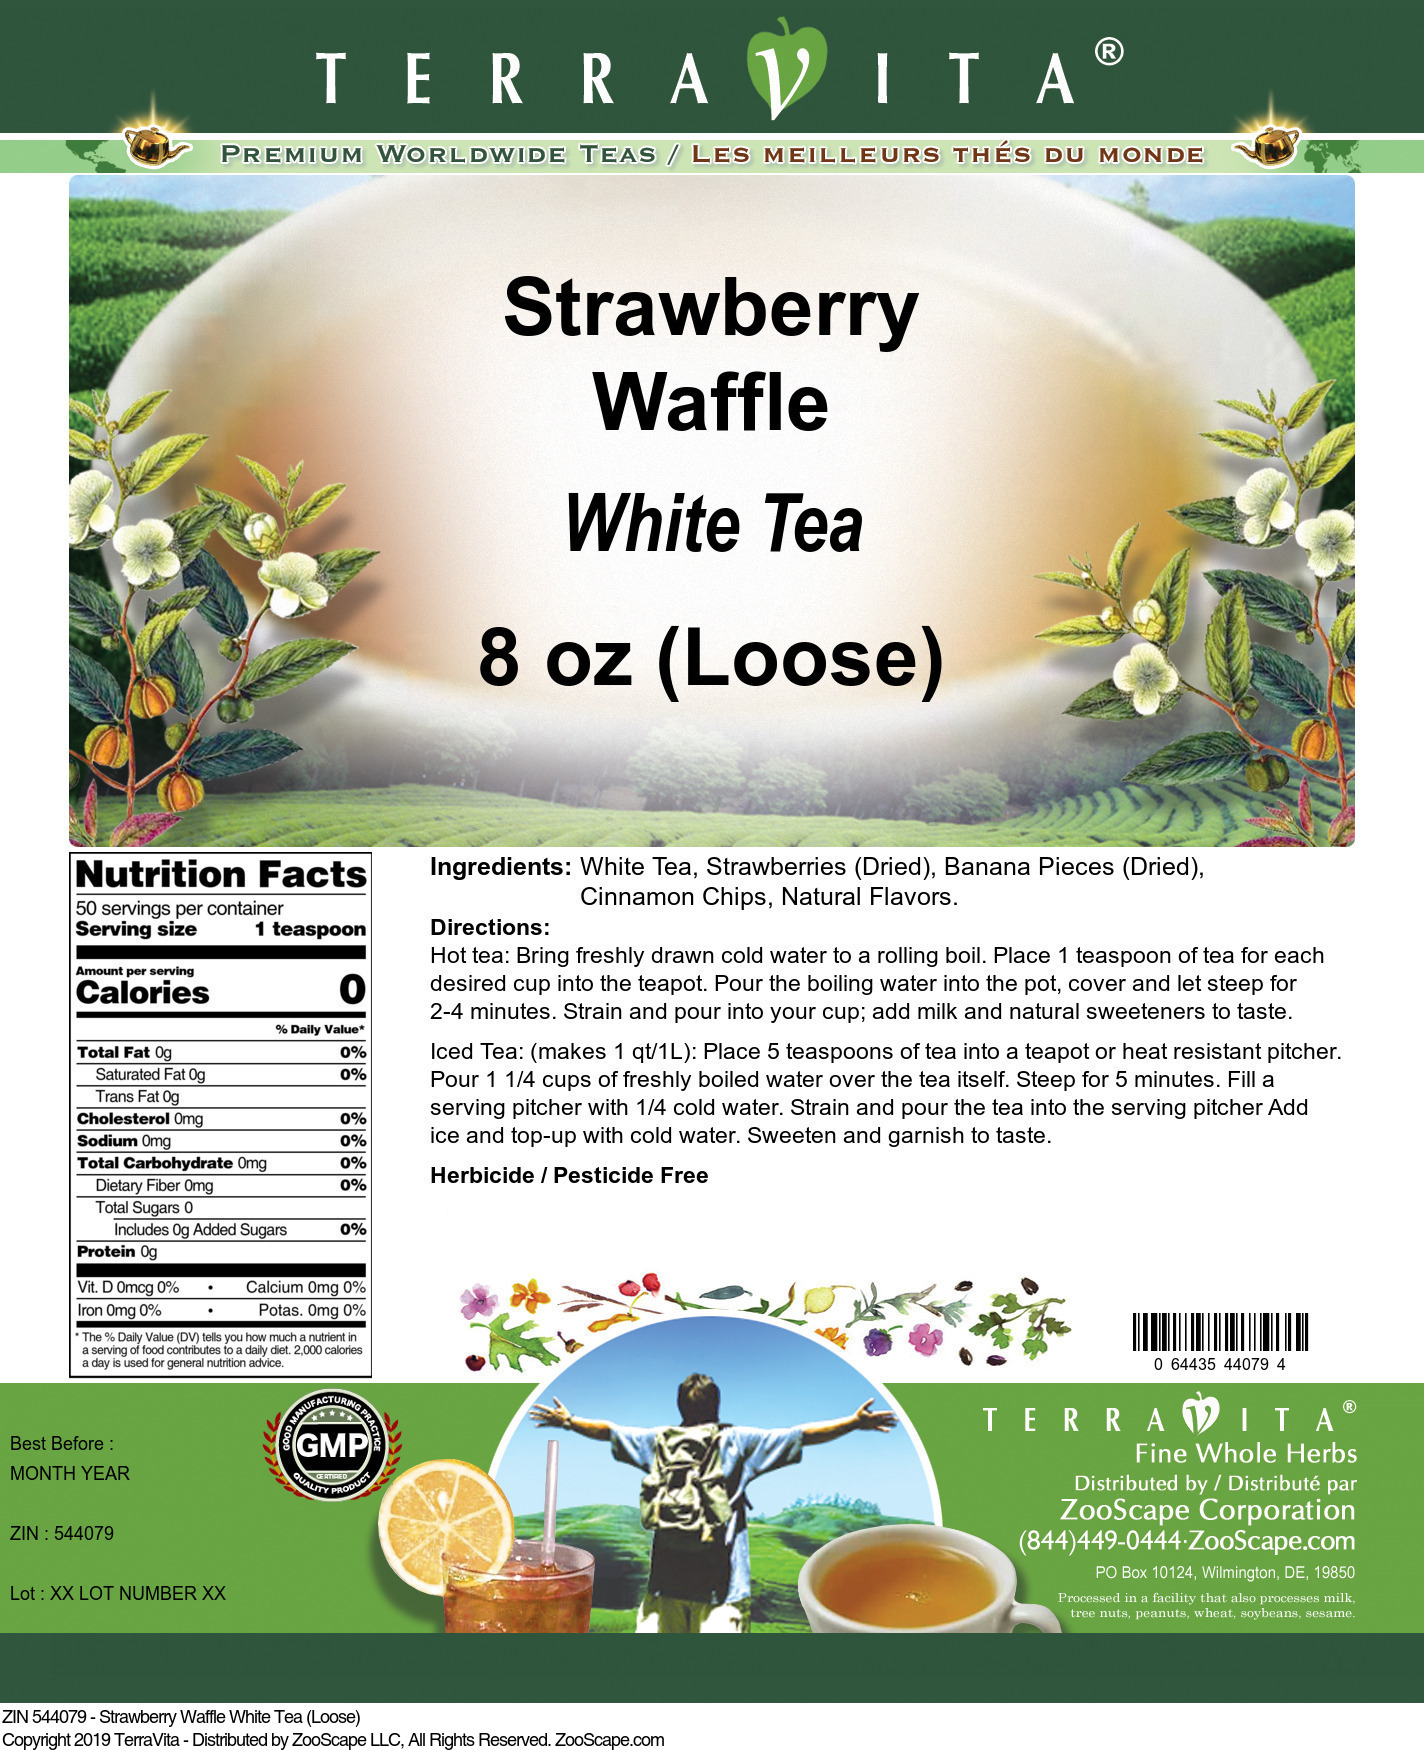 Strawberry Waffle White Tea (Loose)